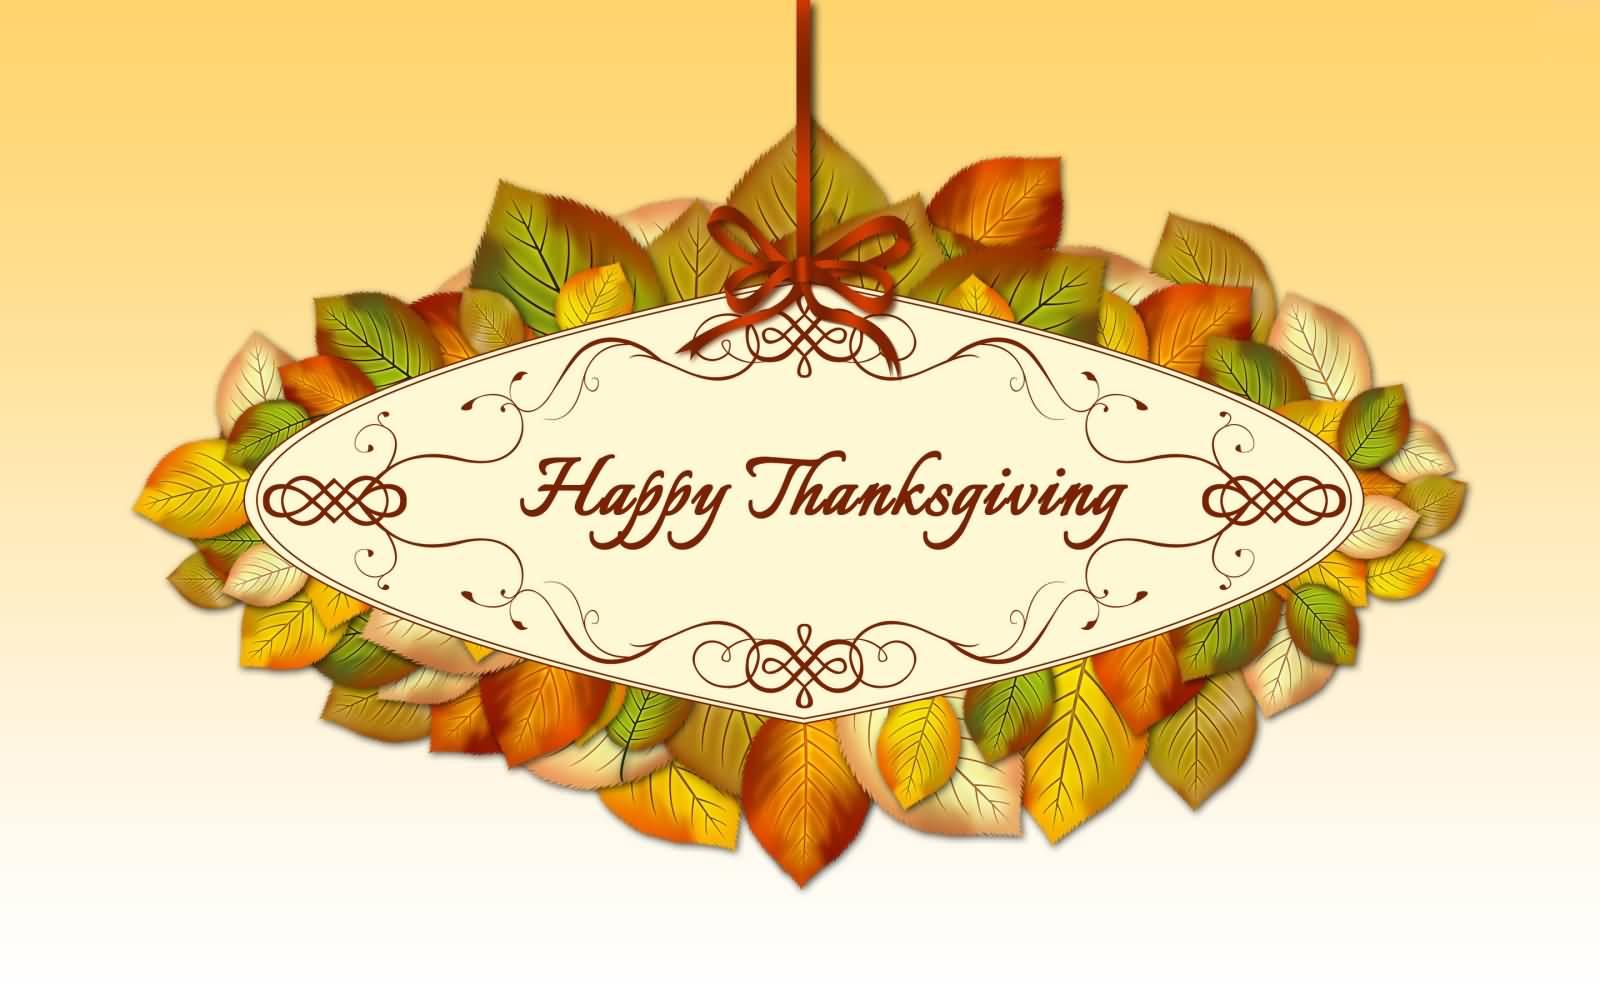 charlie brown thanksgiving desktop wallpaper free